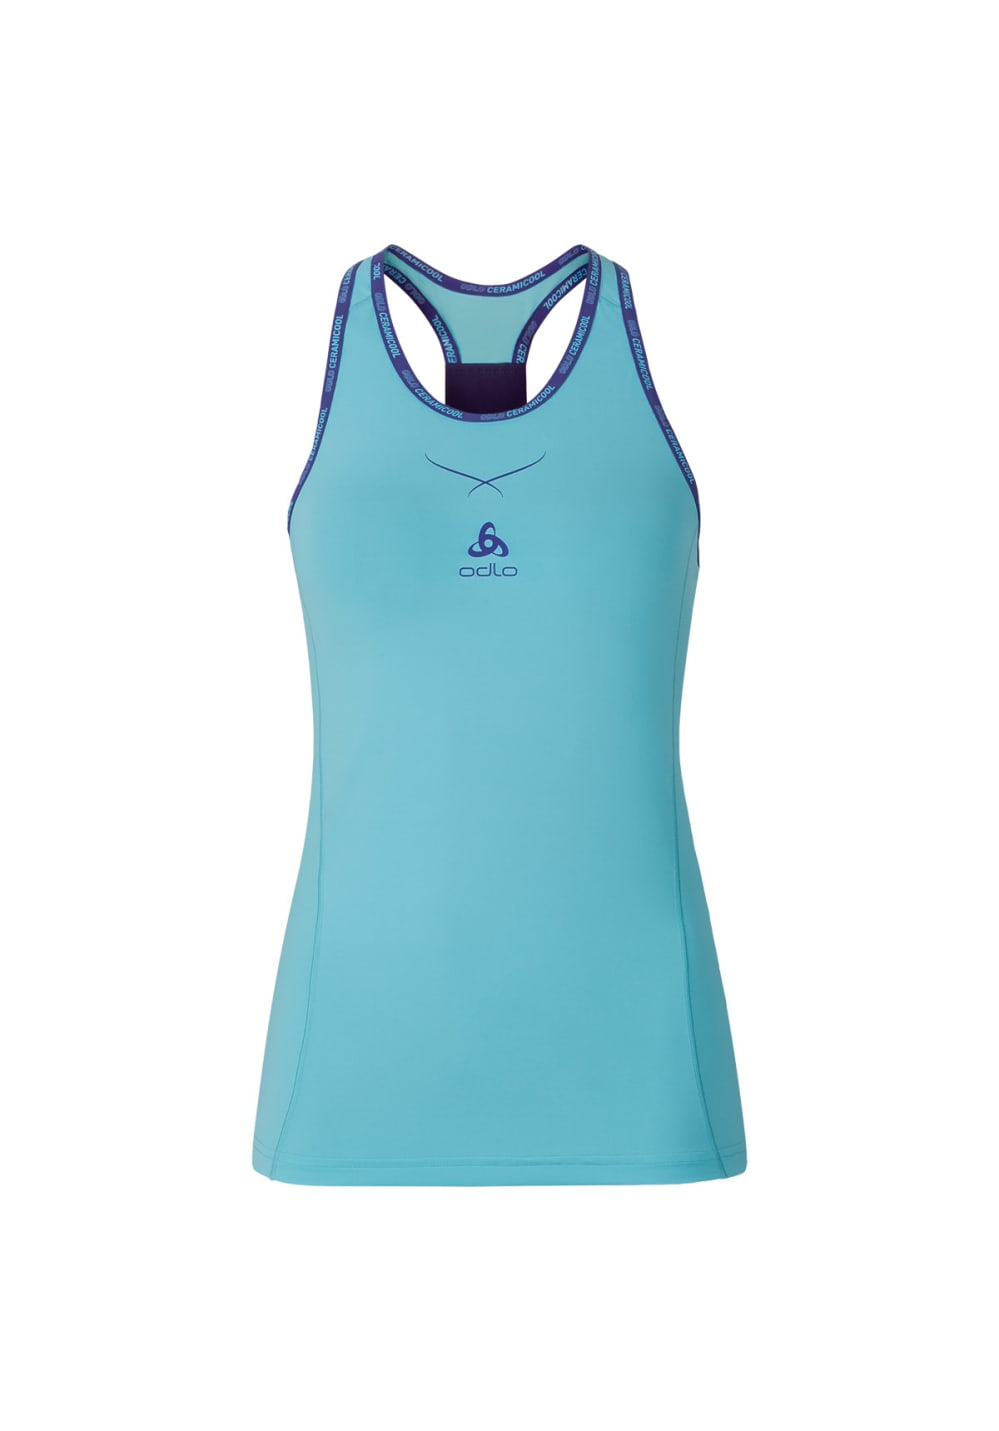 Odlo Shirt S/S Crew Neck Ceramicool Pro Print - Funktionsunterwäsche für Damen